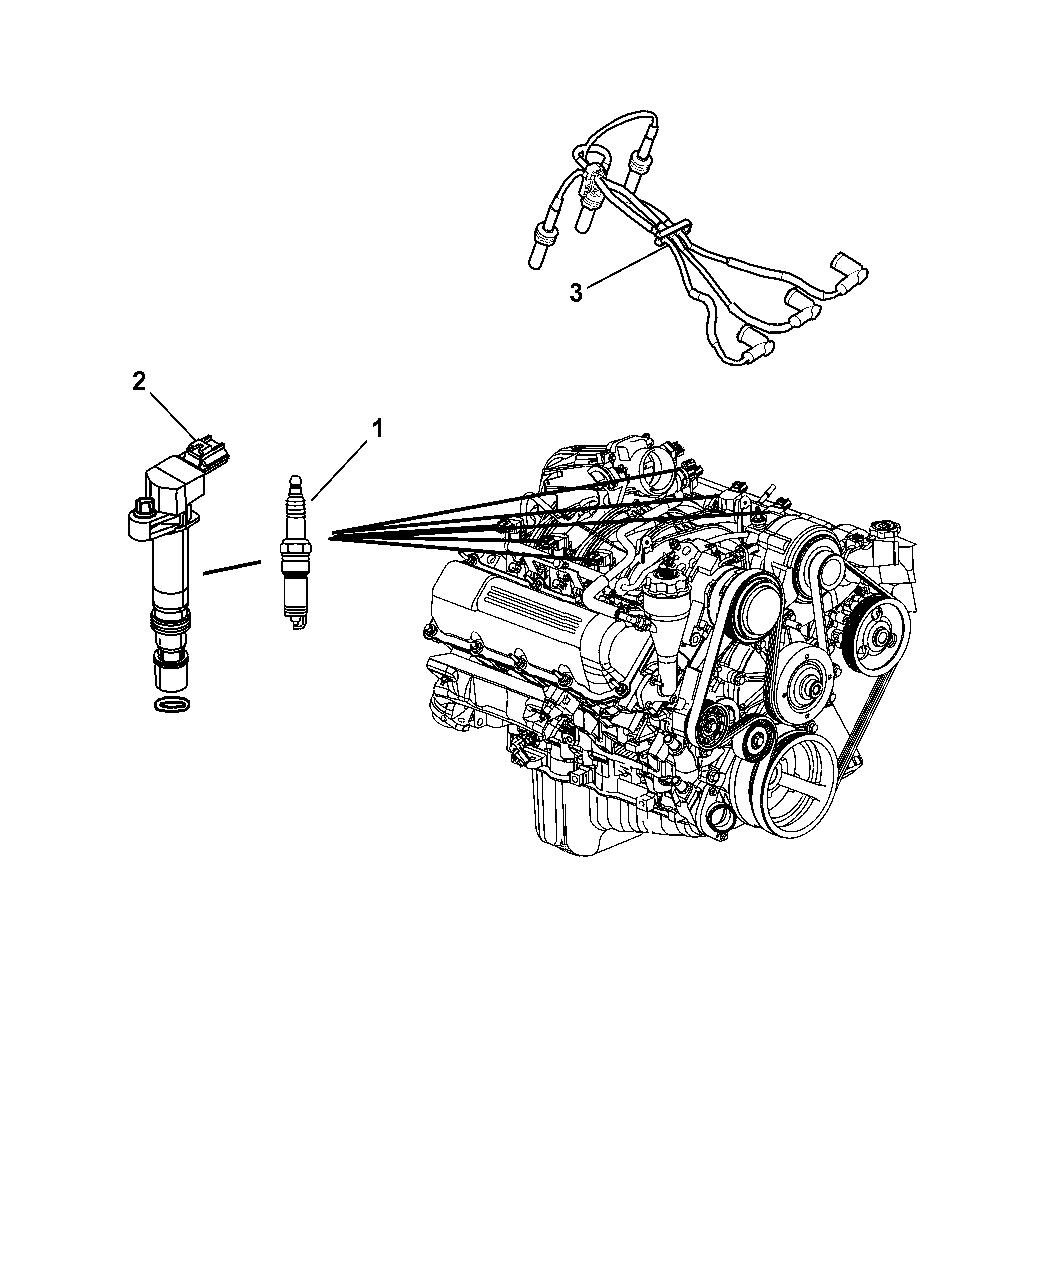 2009    Jeep    Liberty Spark Plug    Wiring       Diagram        Wiring       Diagram